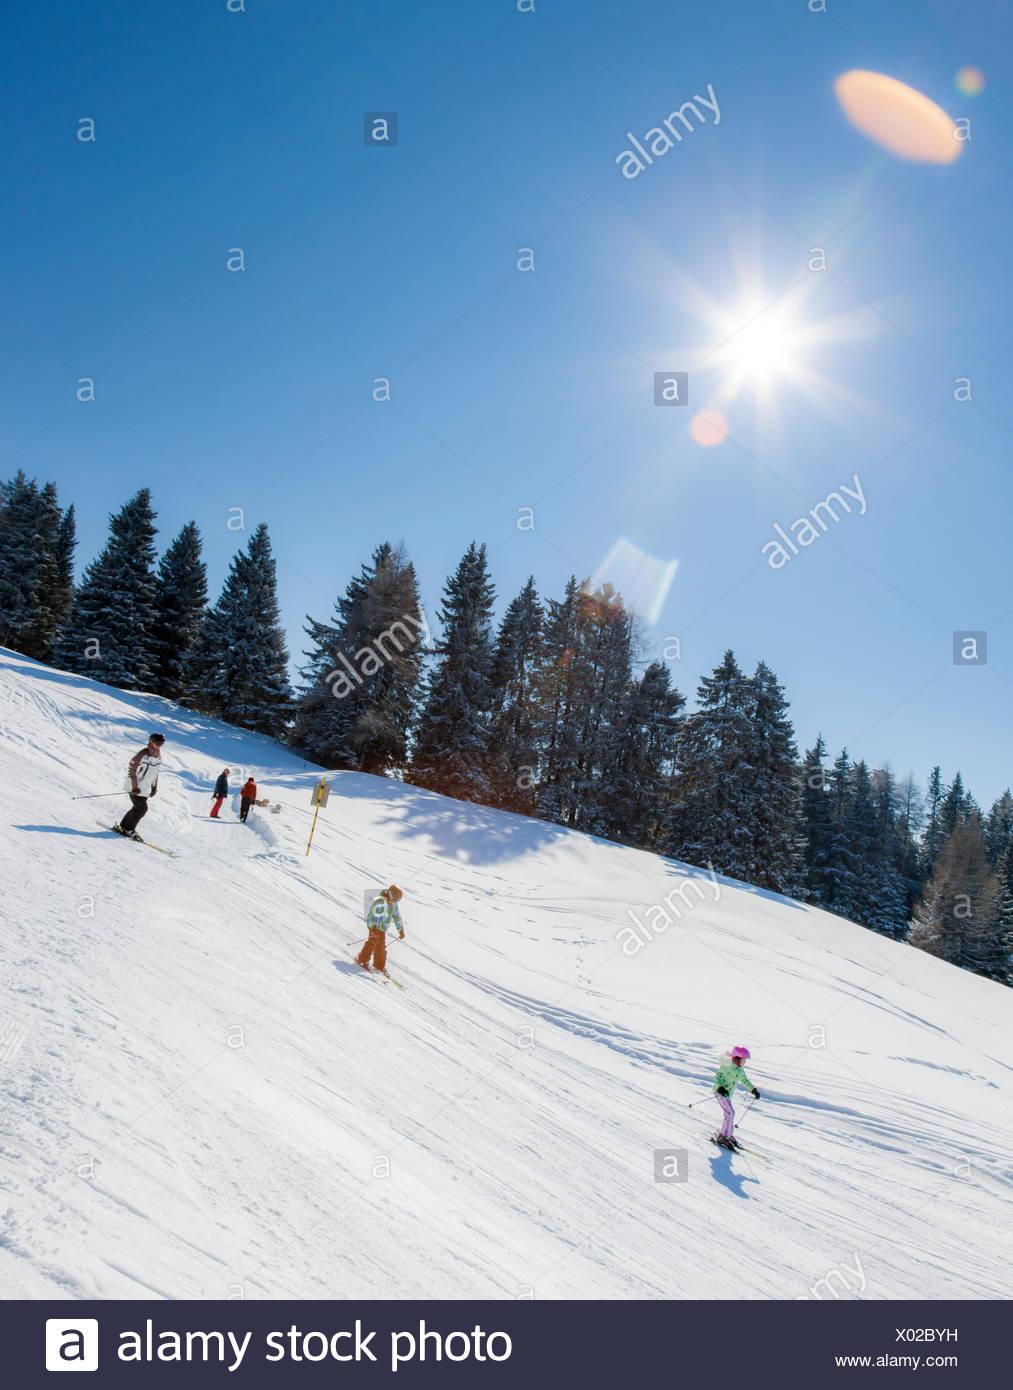 Schweiz, Lenzerheide, Menschen Skifahren Stockbild